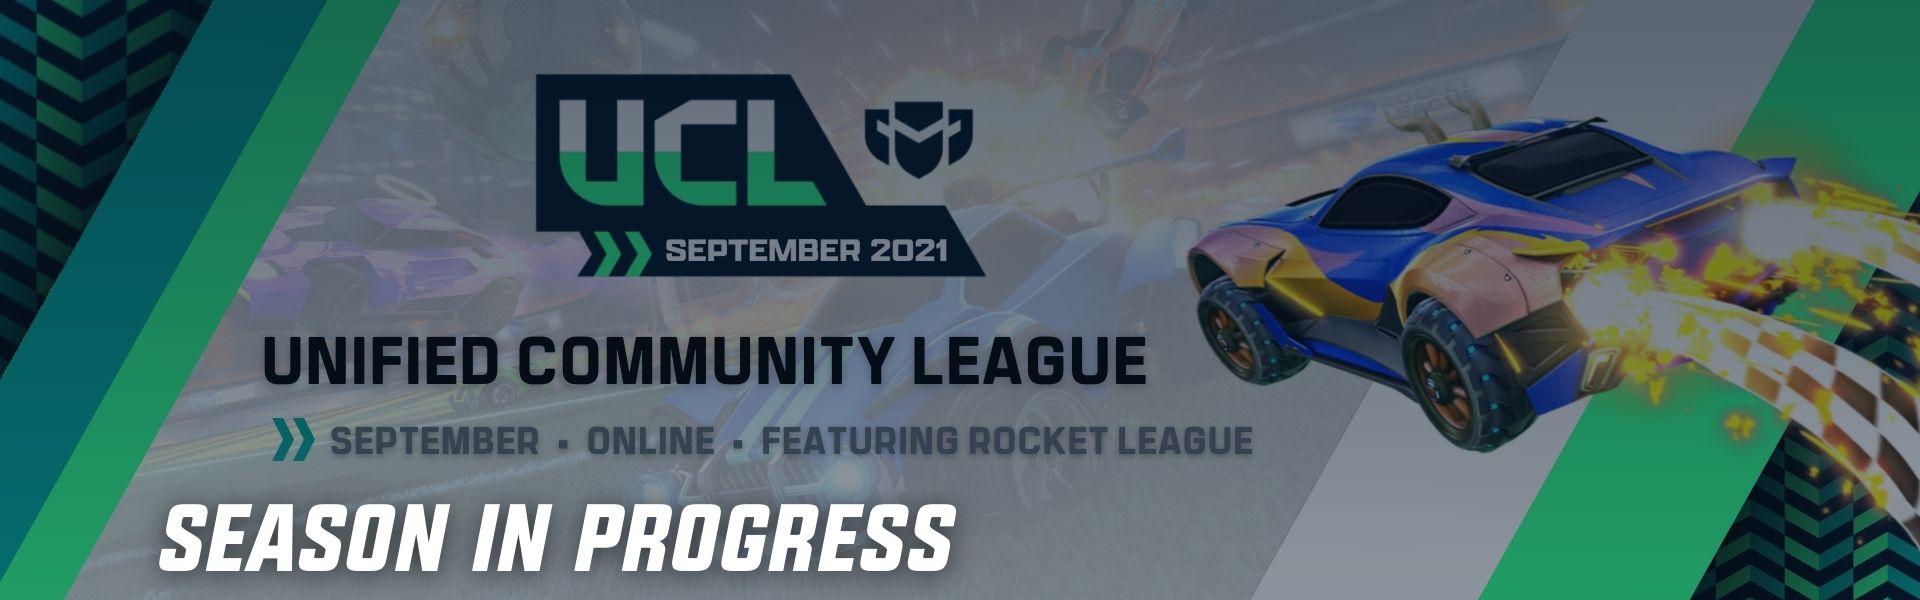 September UCL: Featuring Rocket League